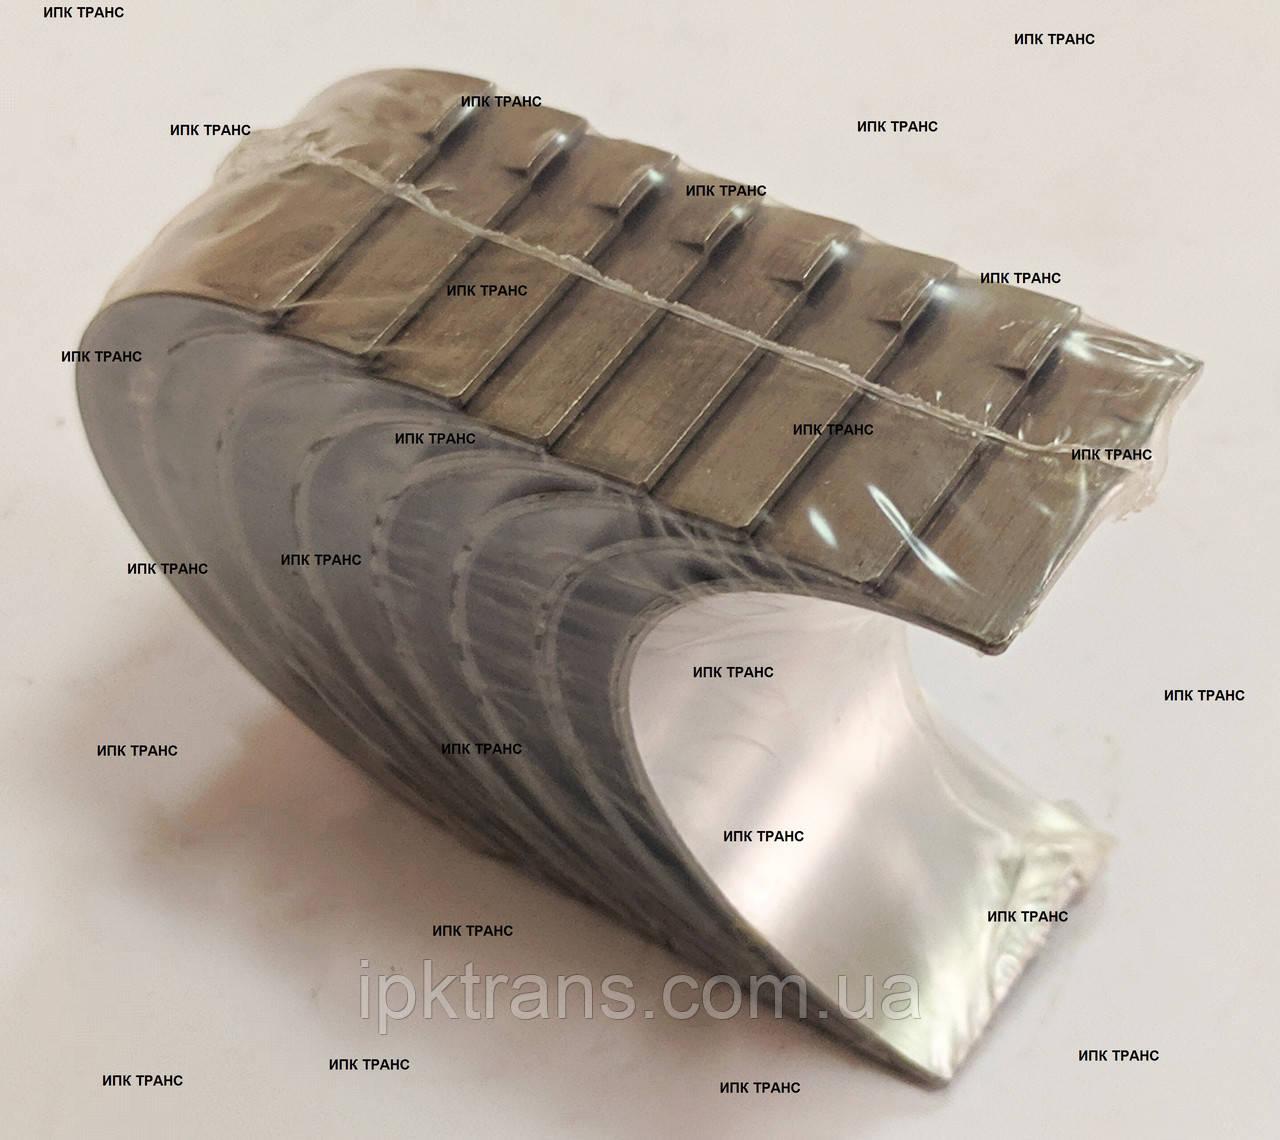 Вкладыши шатунные двигателя NISSAN TD27 +0,5 1211843G01, 12118-43G01